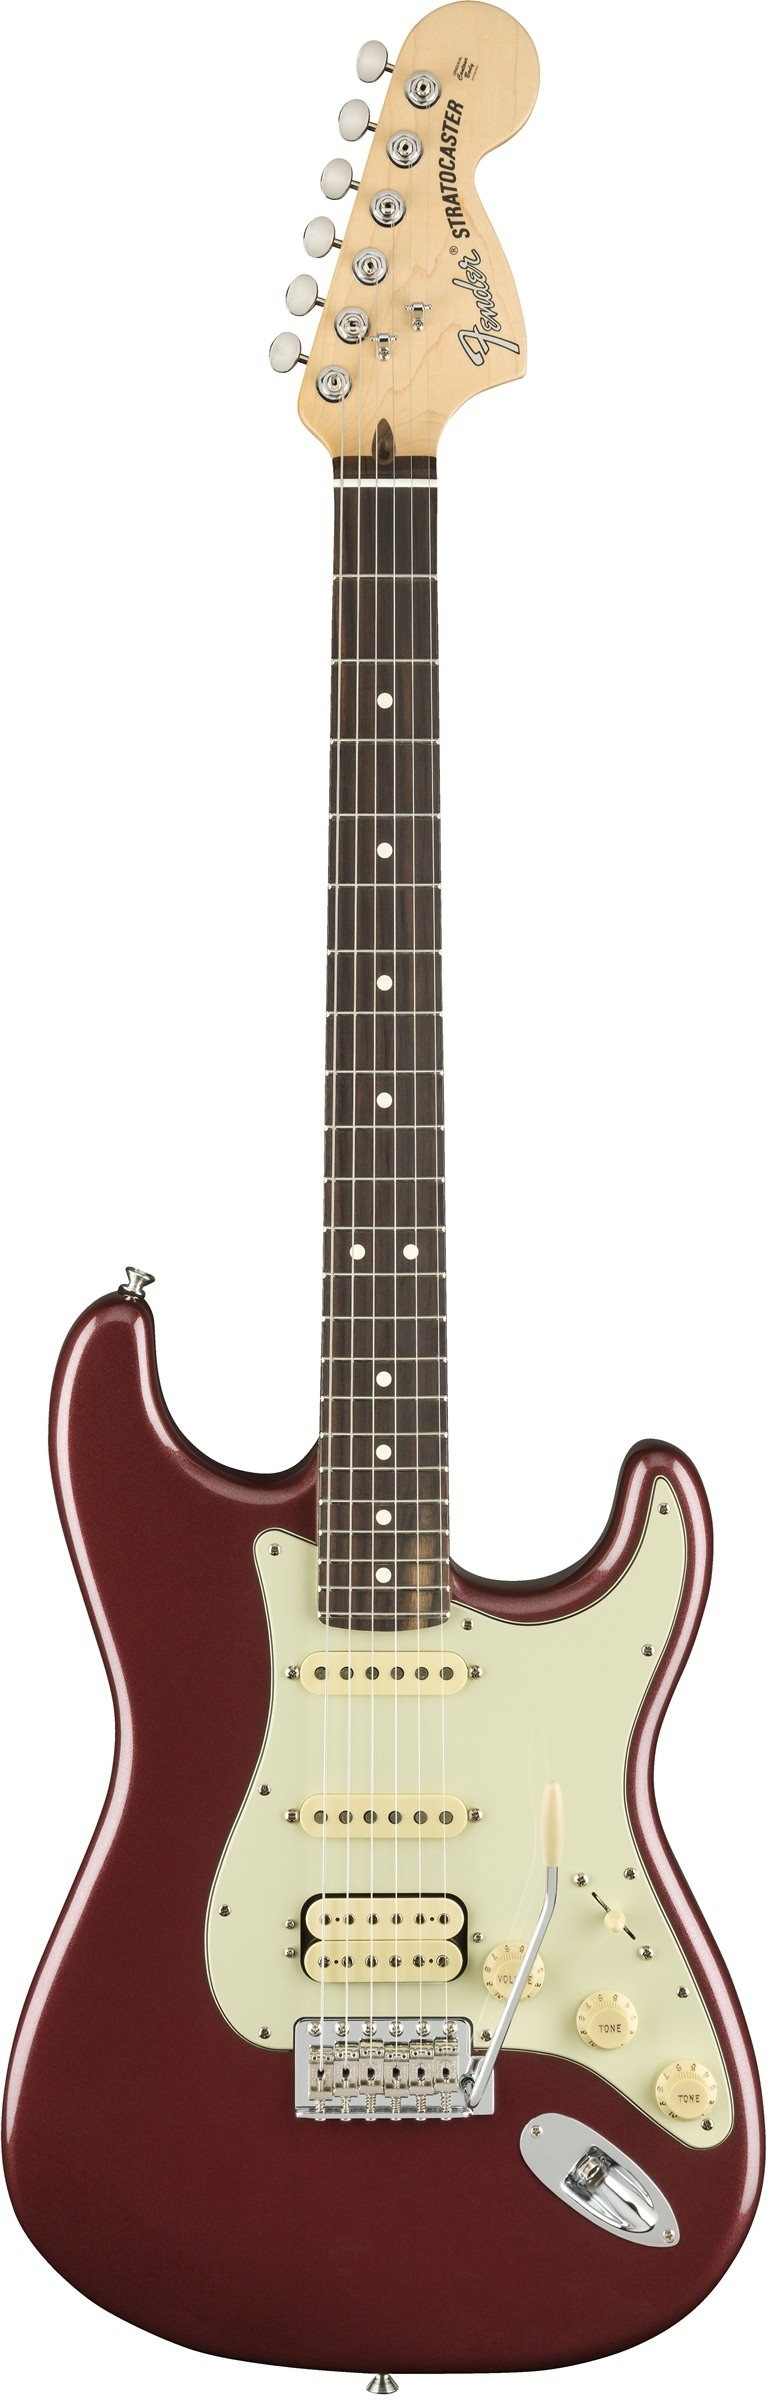 Электрогитара Fender American Performer Stratocaster HSS Rosewood Fingerboard Aubergine